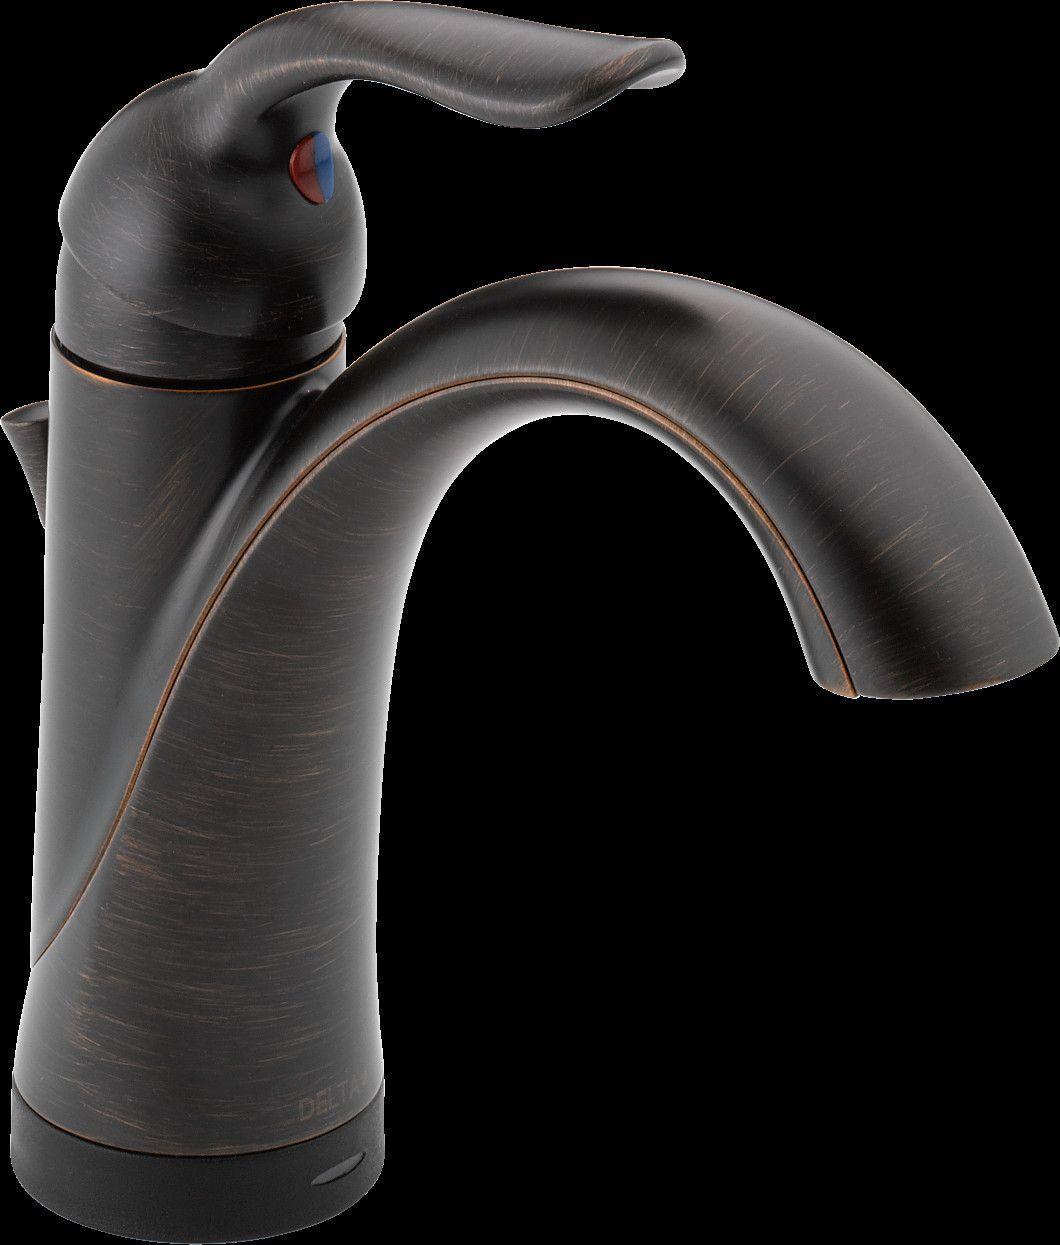 Lahara Single hole Bathroom Faucet with Drain Assembly and Diamond ...